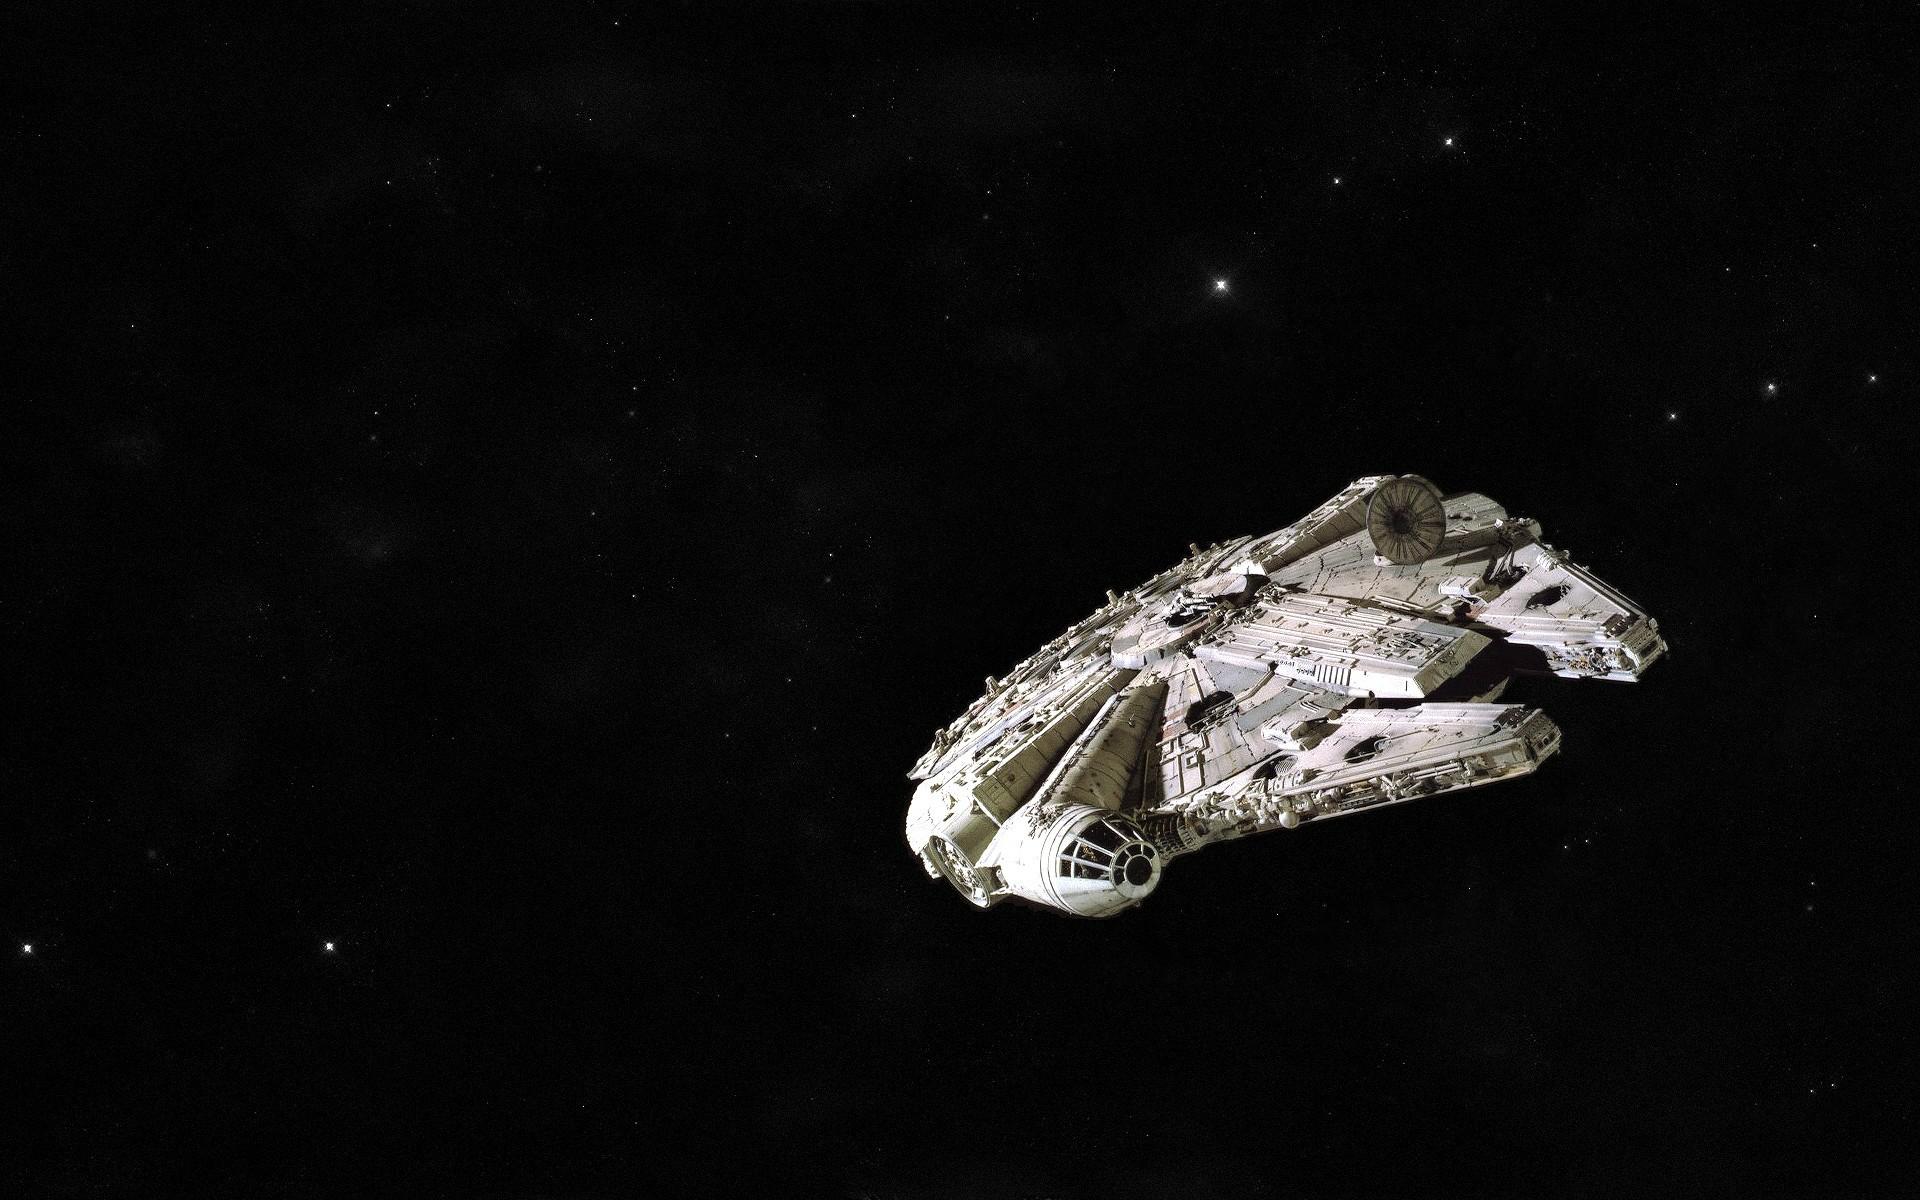 Star Wars HD Wallpaper | Background Image | 1920x1200 | ID ...